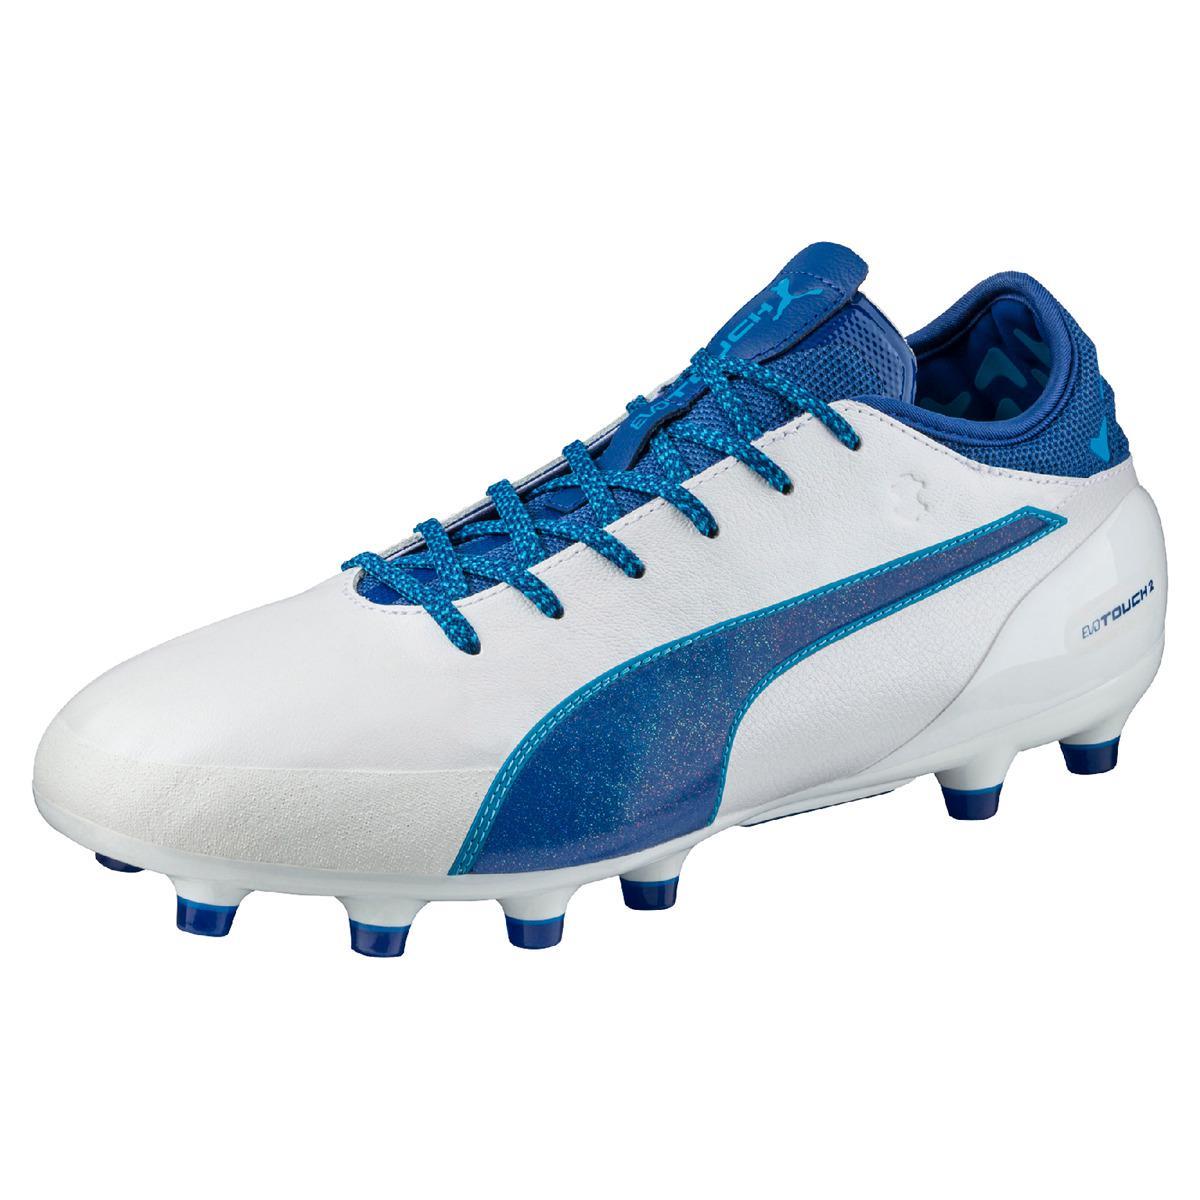 puma football boots white